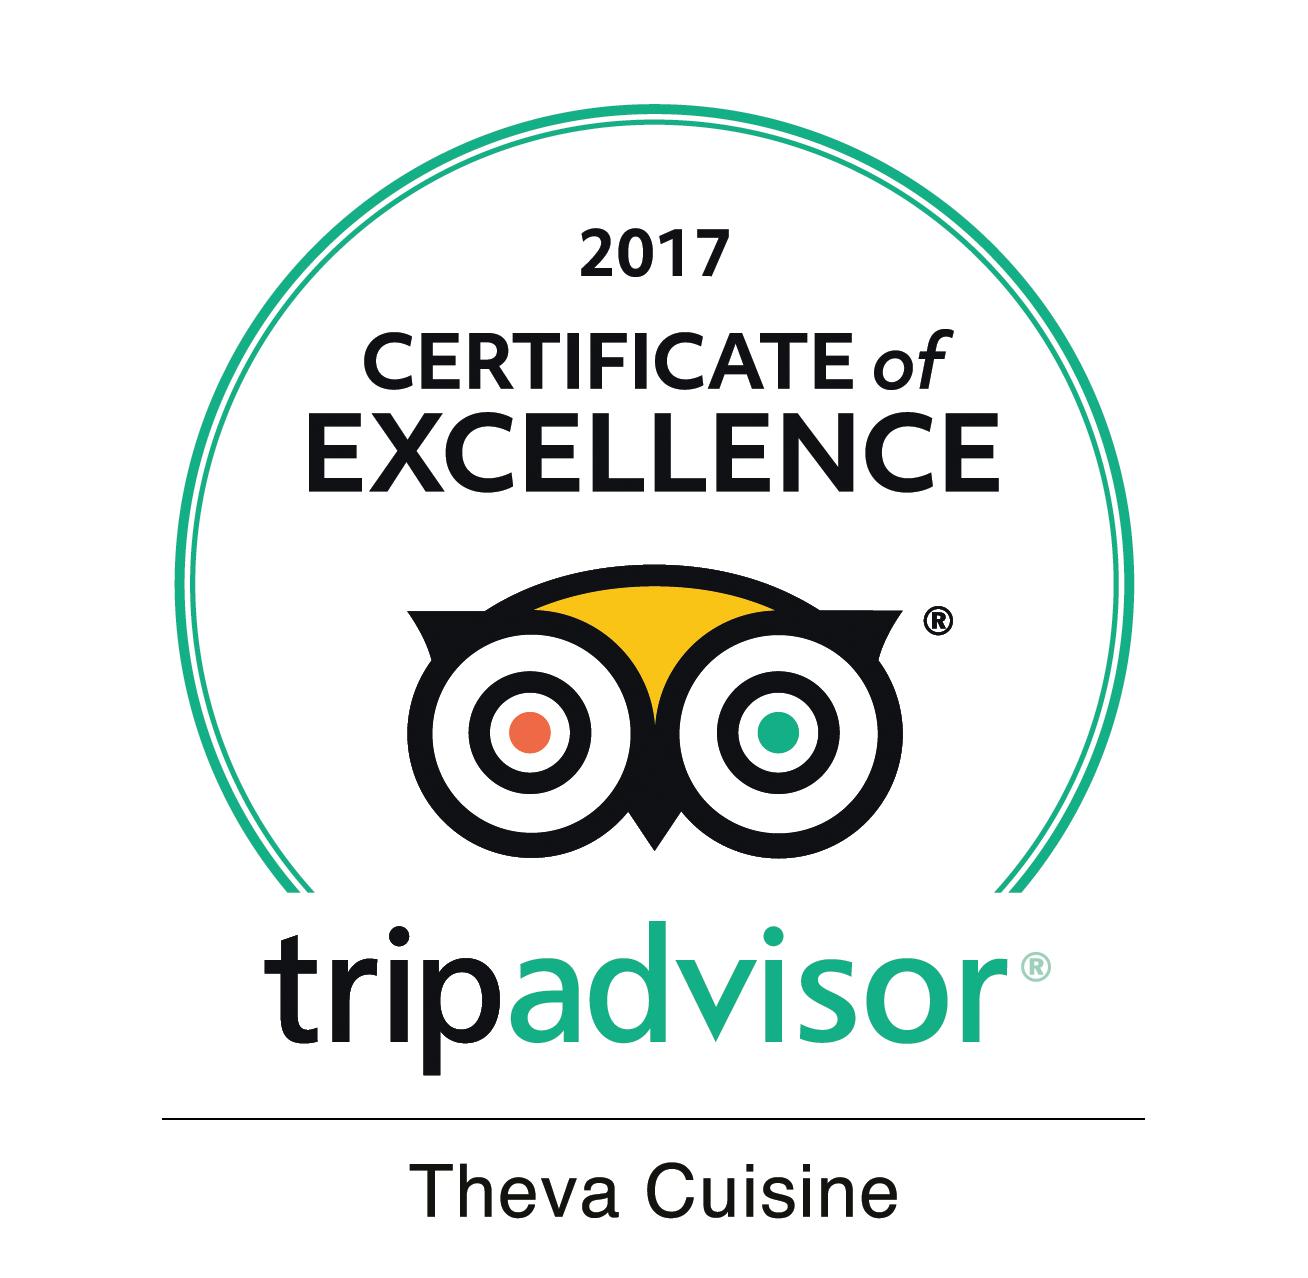 tripadvisor-2017-c.png